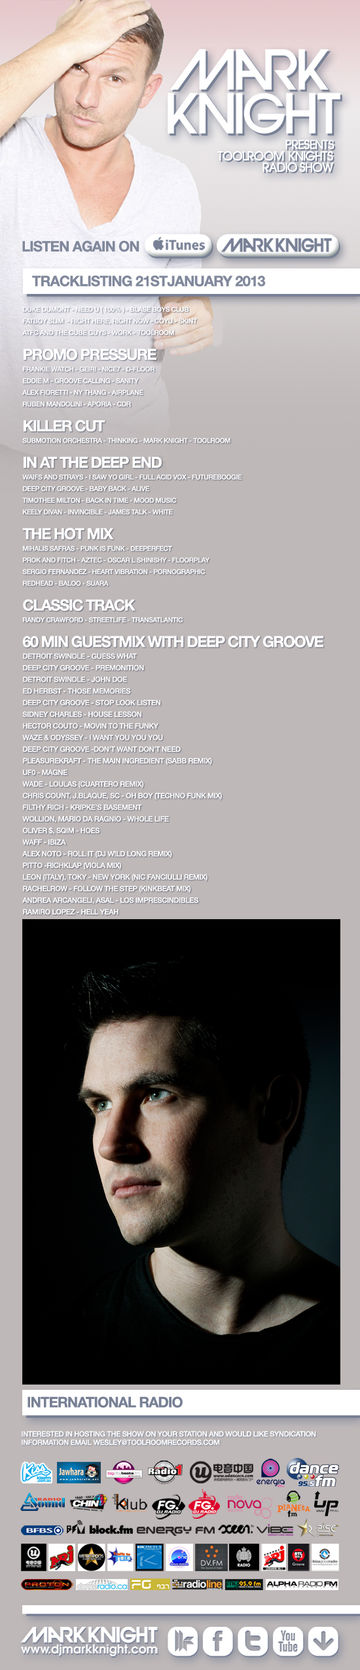 2013-01-21 - Mark Knight, Deep City Groove - Toolroom Knights.jpg